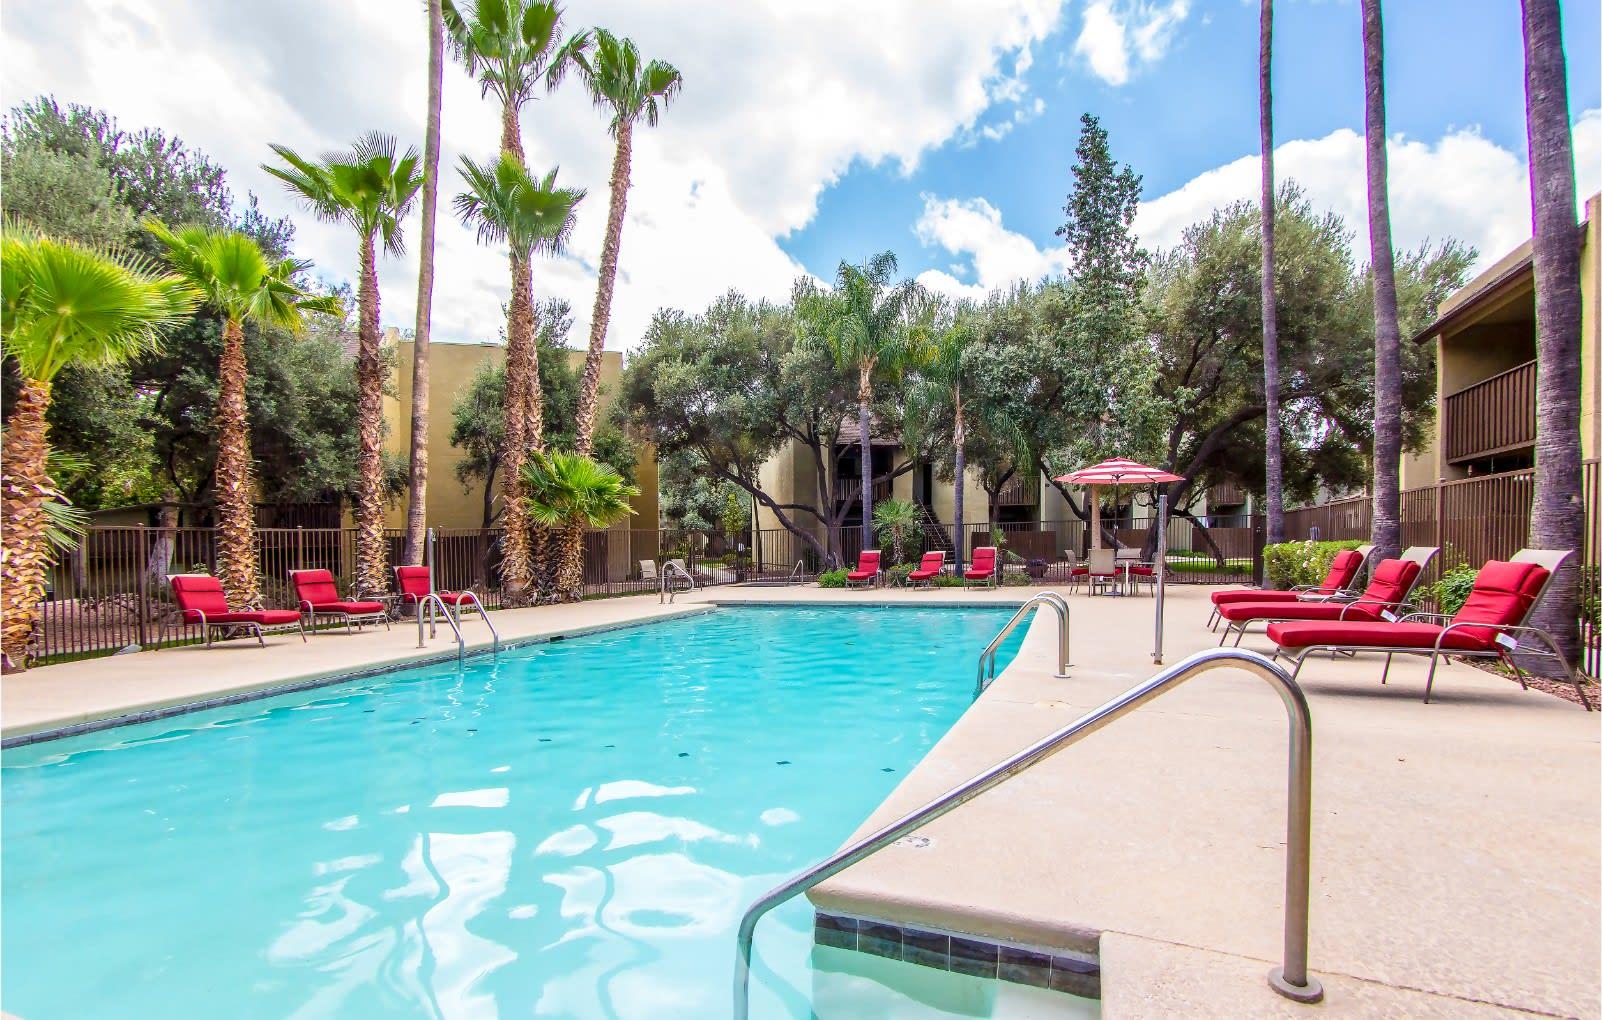 Pool & pool patio at River Oaks Apartments in Tucson, AZ